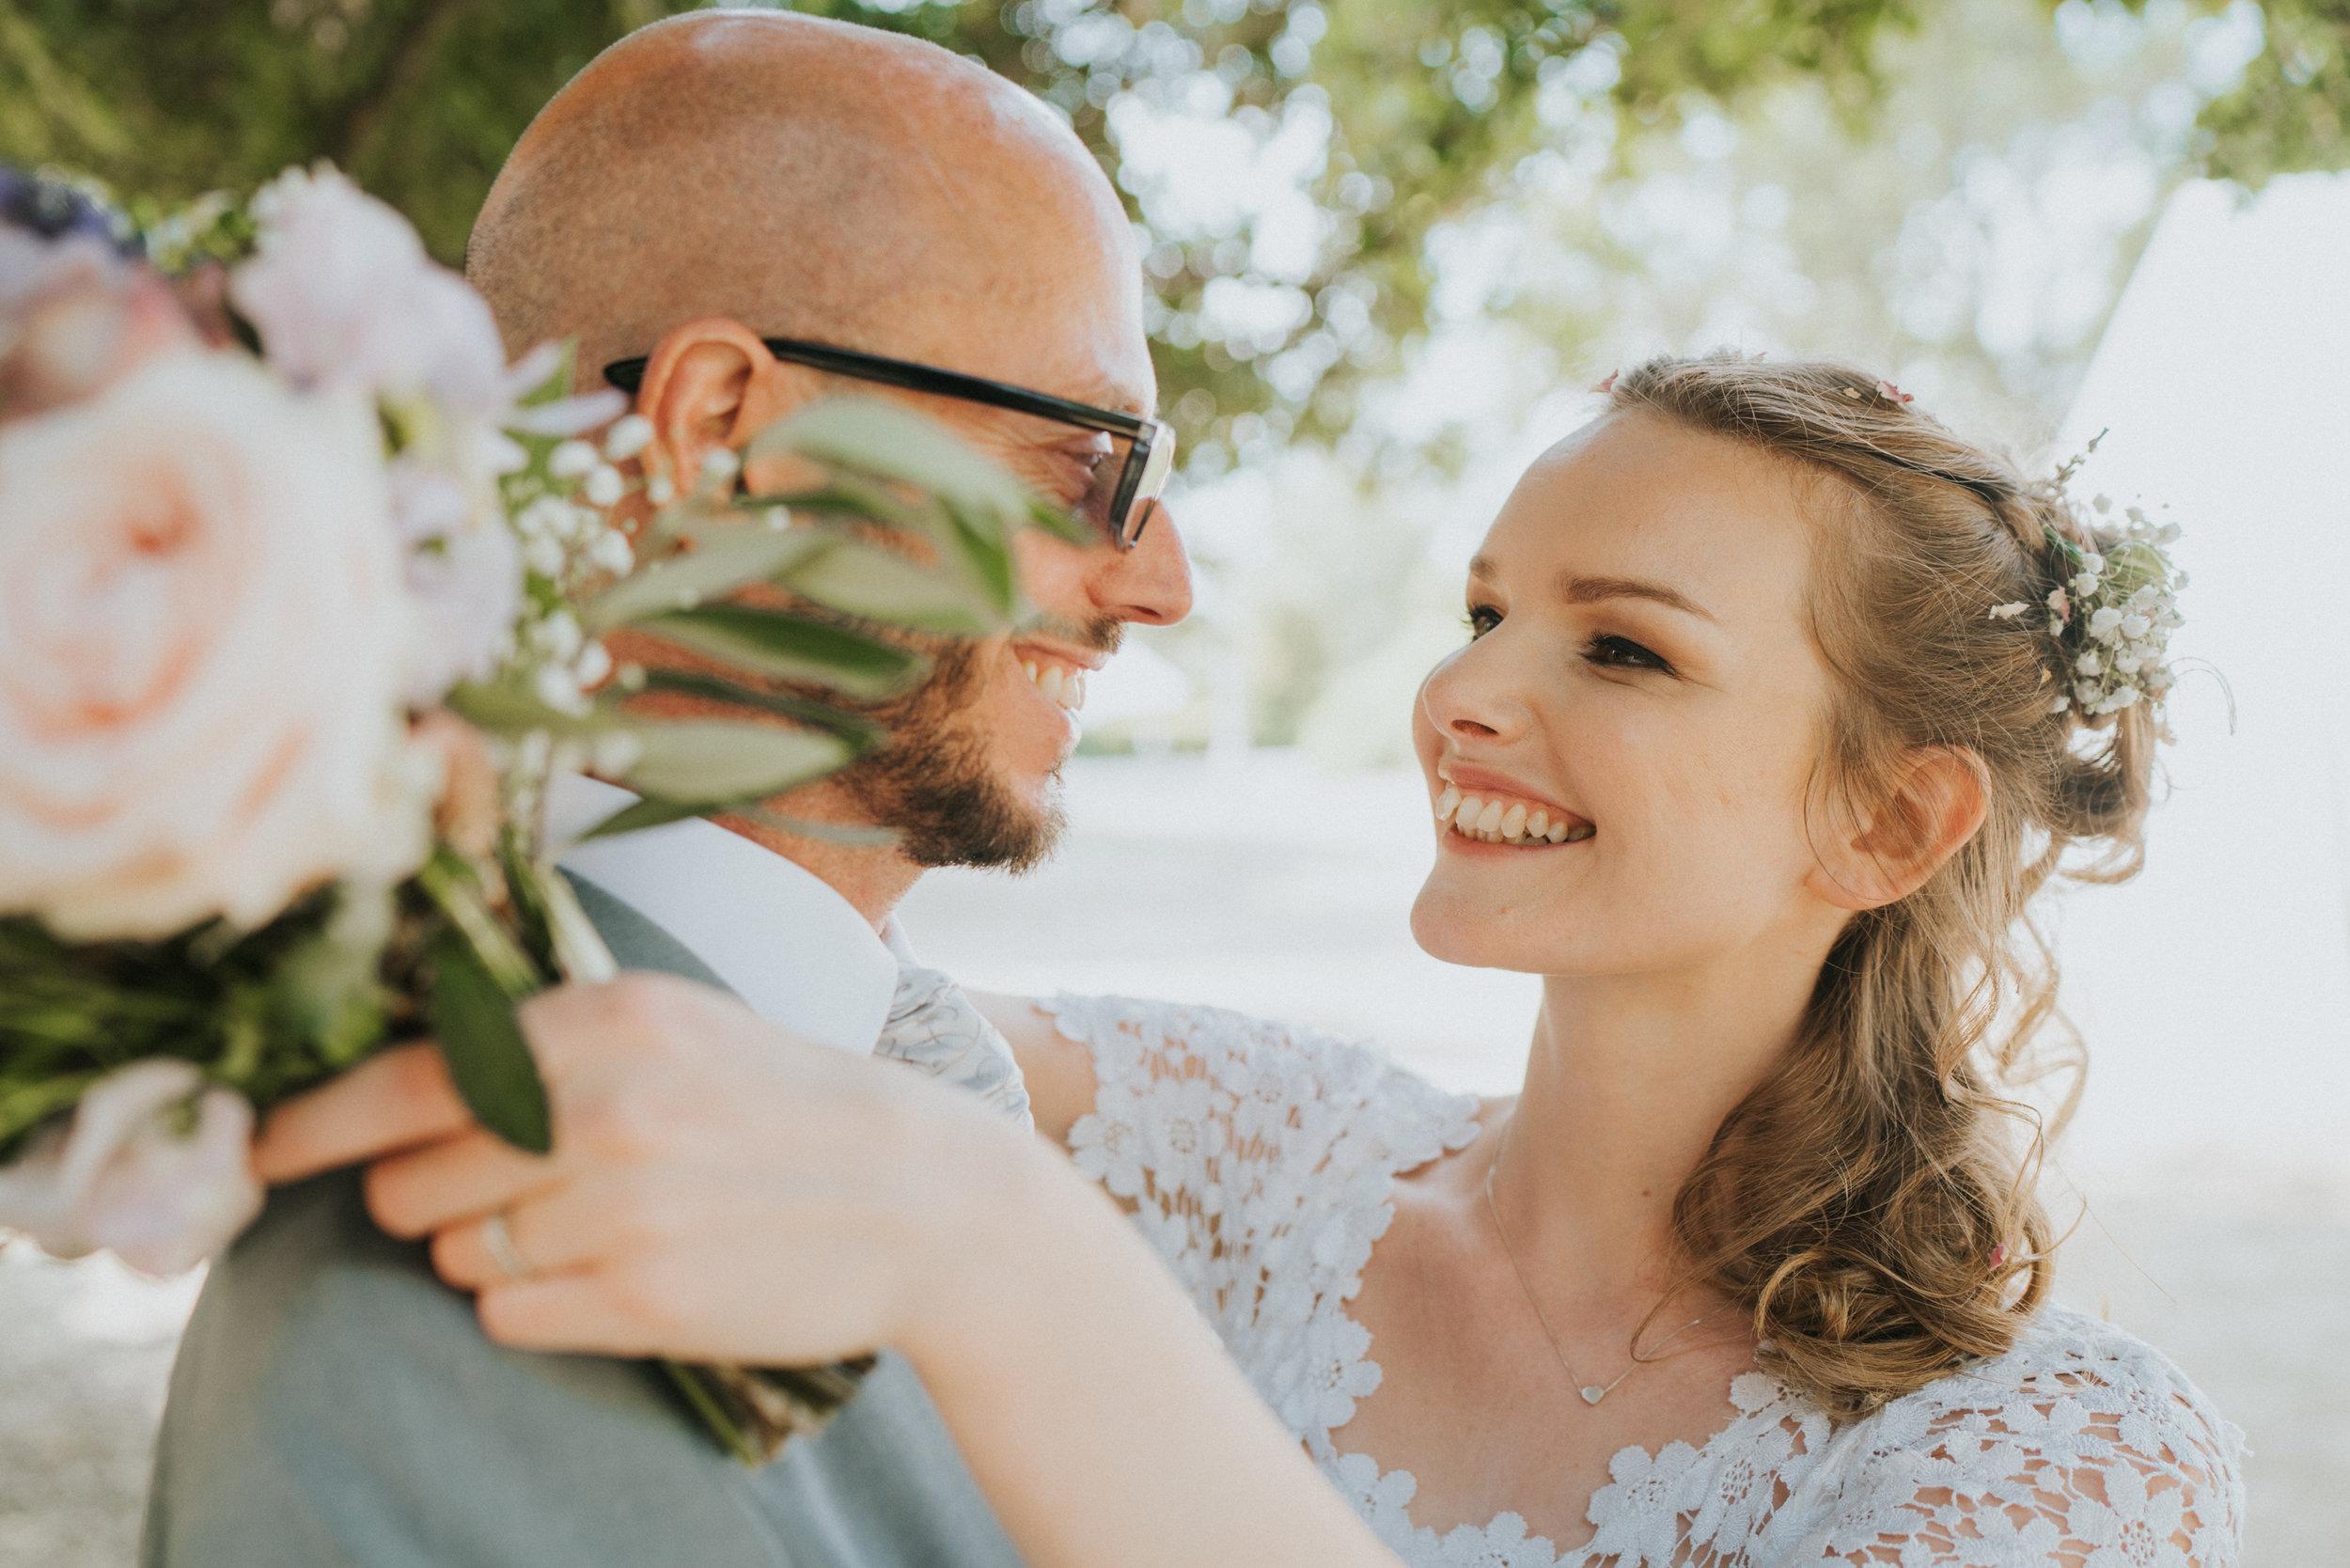 Grace-Elizabeth-Georgie-Amalaketu-Firstsite-Colchester-Essex-Boho-Buddhist-Wedding-Alternative-Wedding-Photography-Essex (85 of 100).jpg